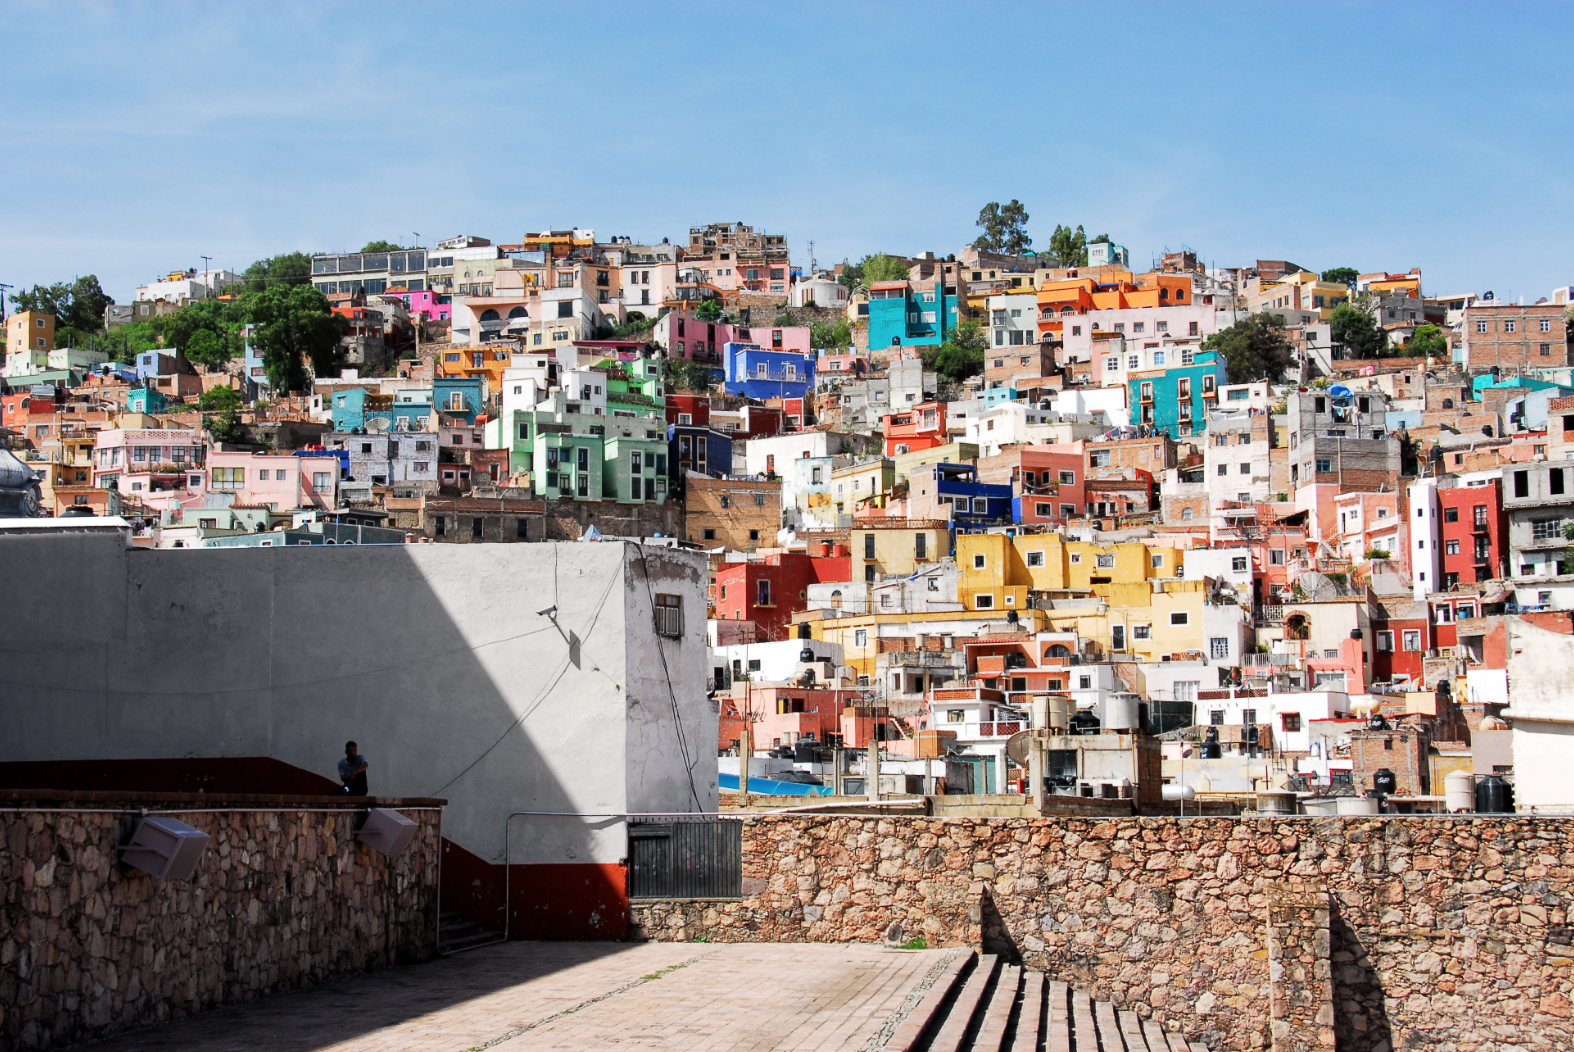 Guanajuato, México  (Source: LA.Network).